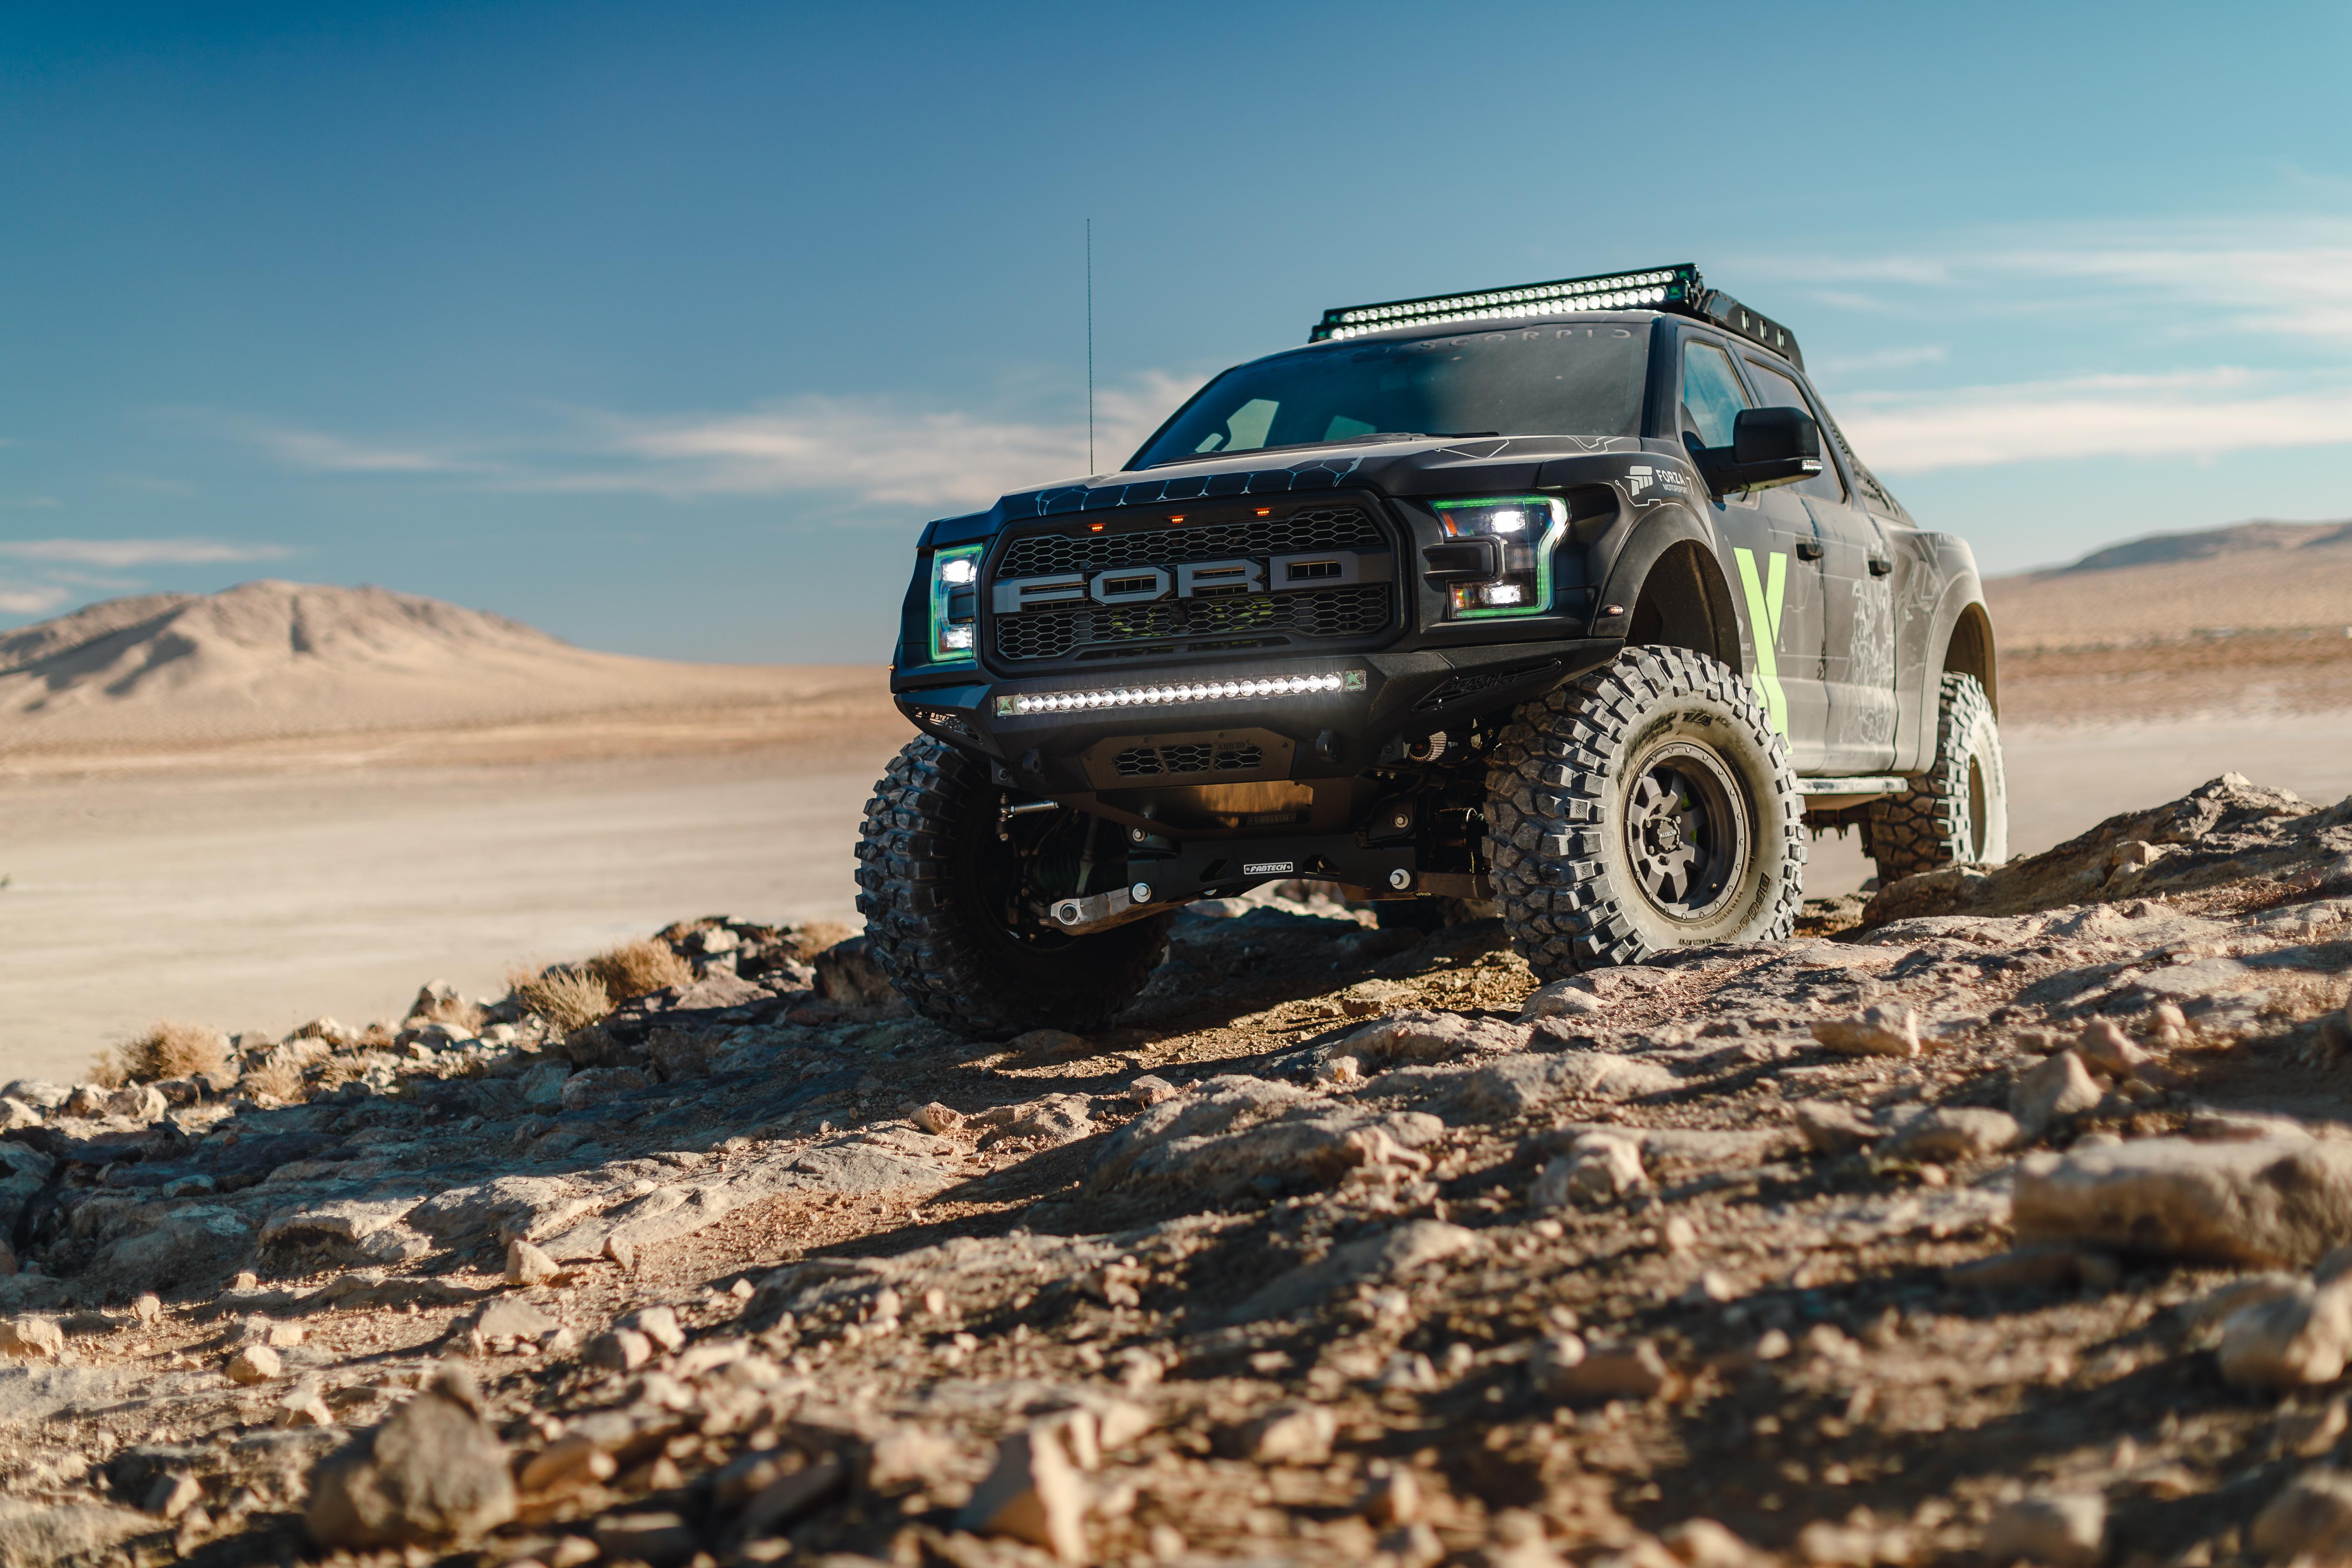 Ford Raptor F150 Off Road Kit 5472x3648 Wallpaper Teahub Io